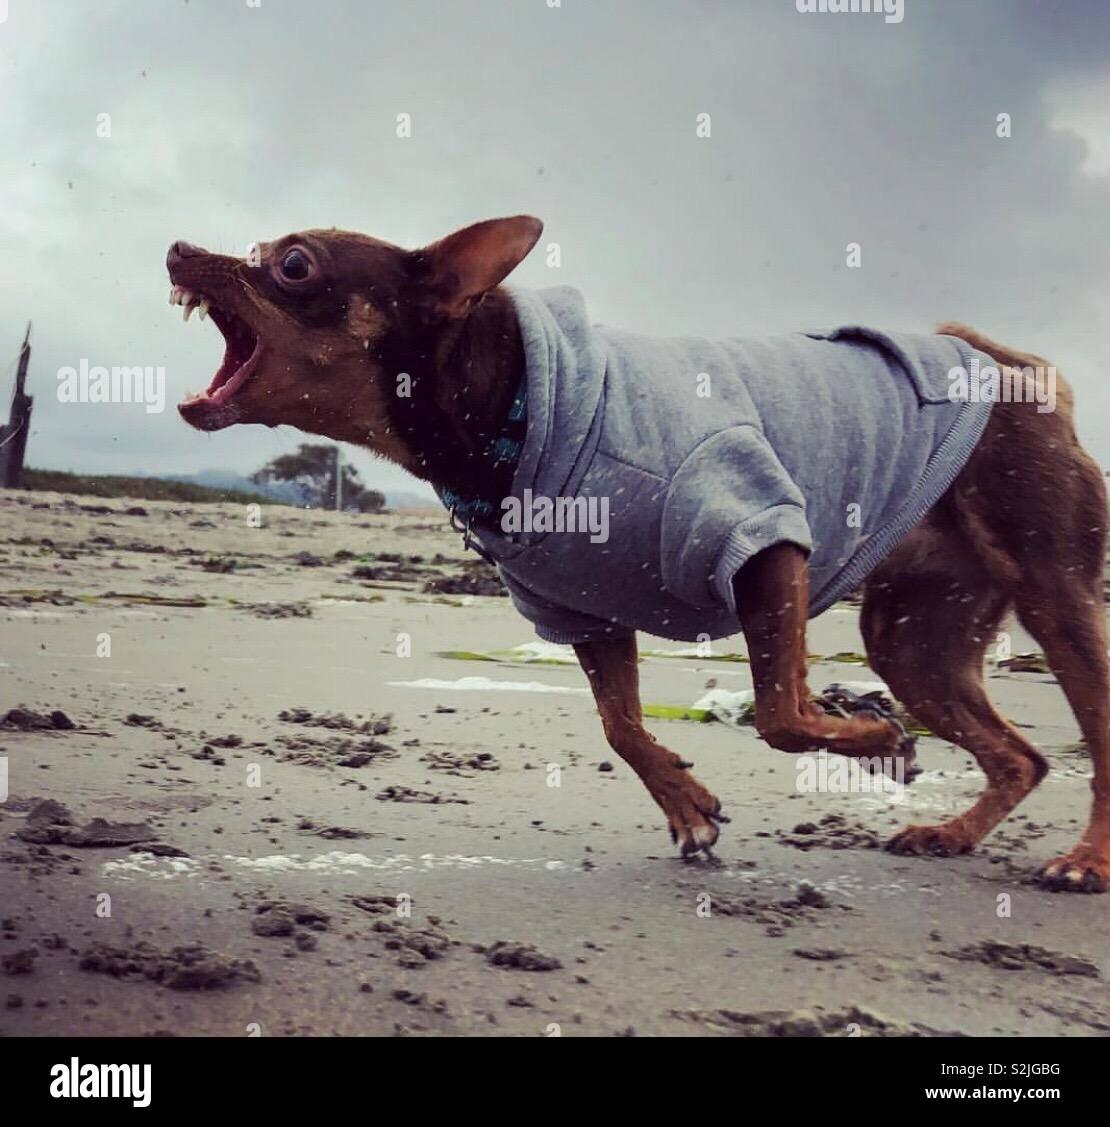 Snarling chihuahua. - Stock Image